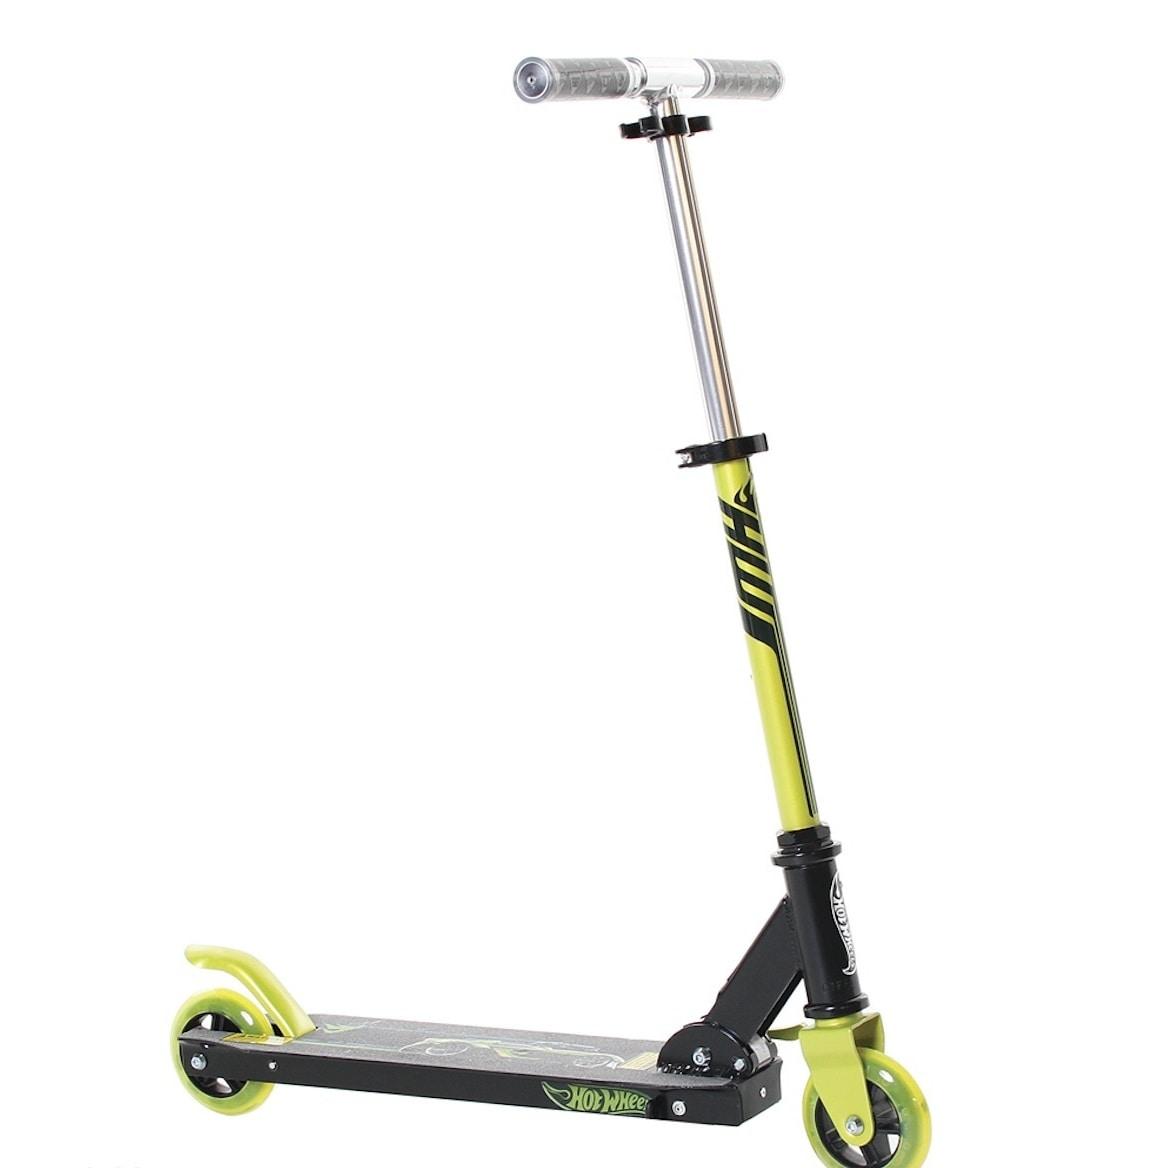 Hot Wheels Folding Scooter (Black)